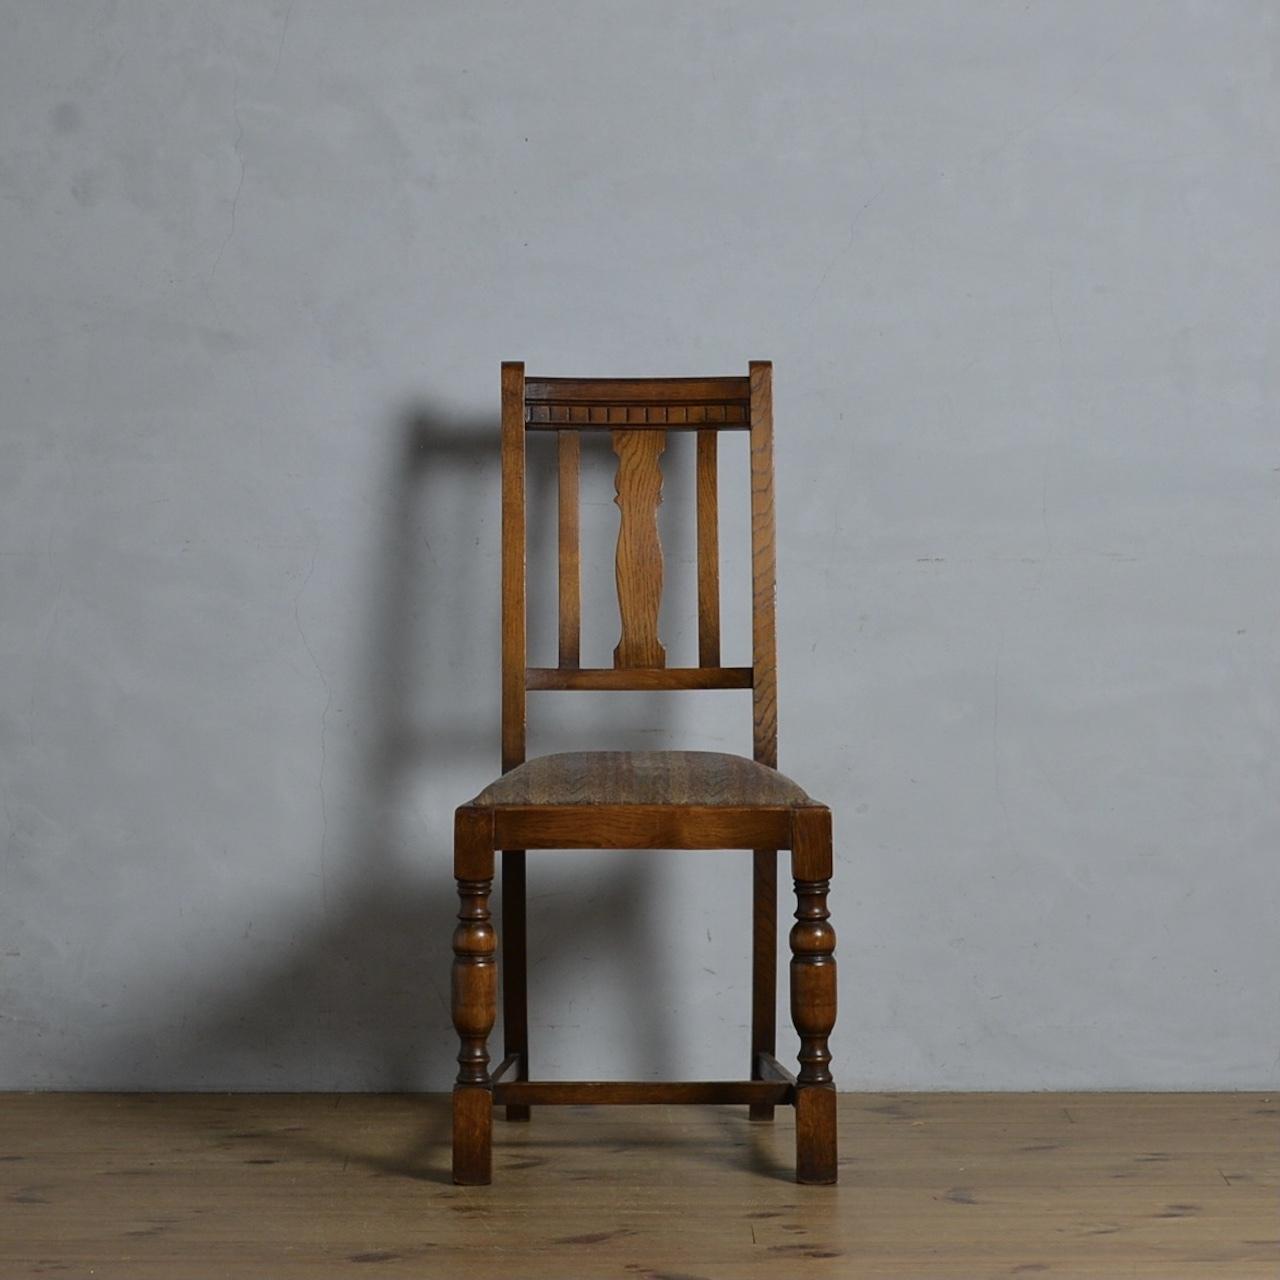 Dining Chair / ダイニングチェア 【A】〈椅子・オークチェア・デスクチェア・クラシック・イギリス・アンティーク・ヴィンテージ〉109957